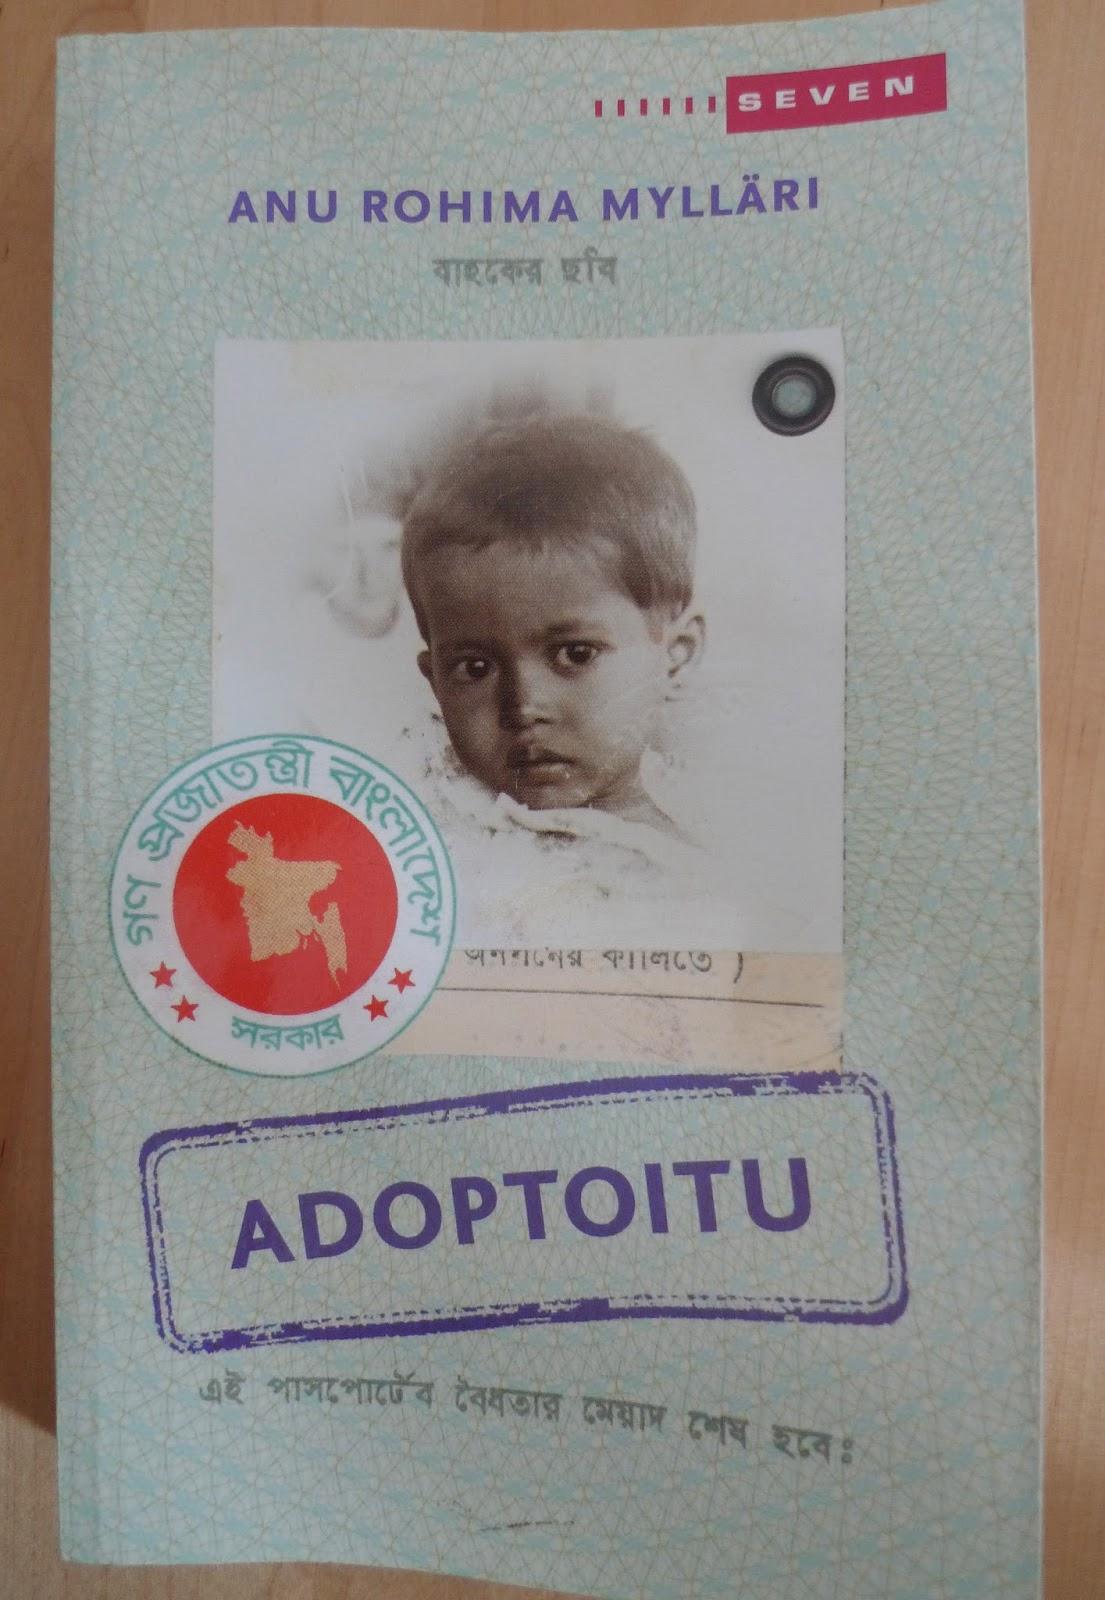 Adoptoitu